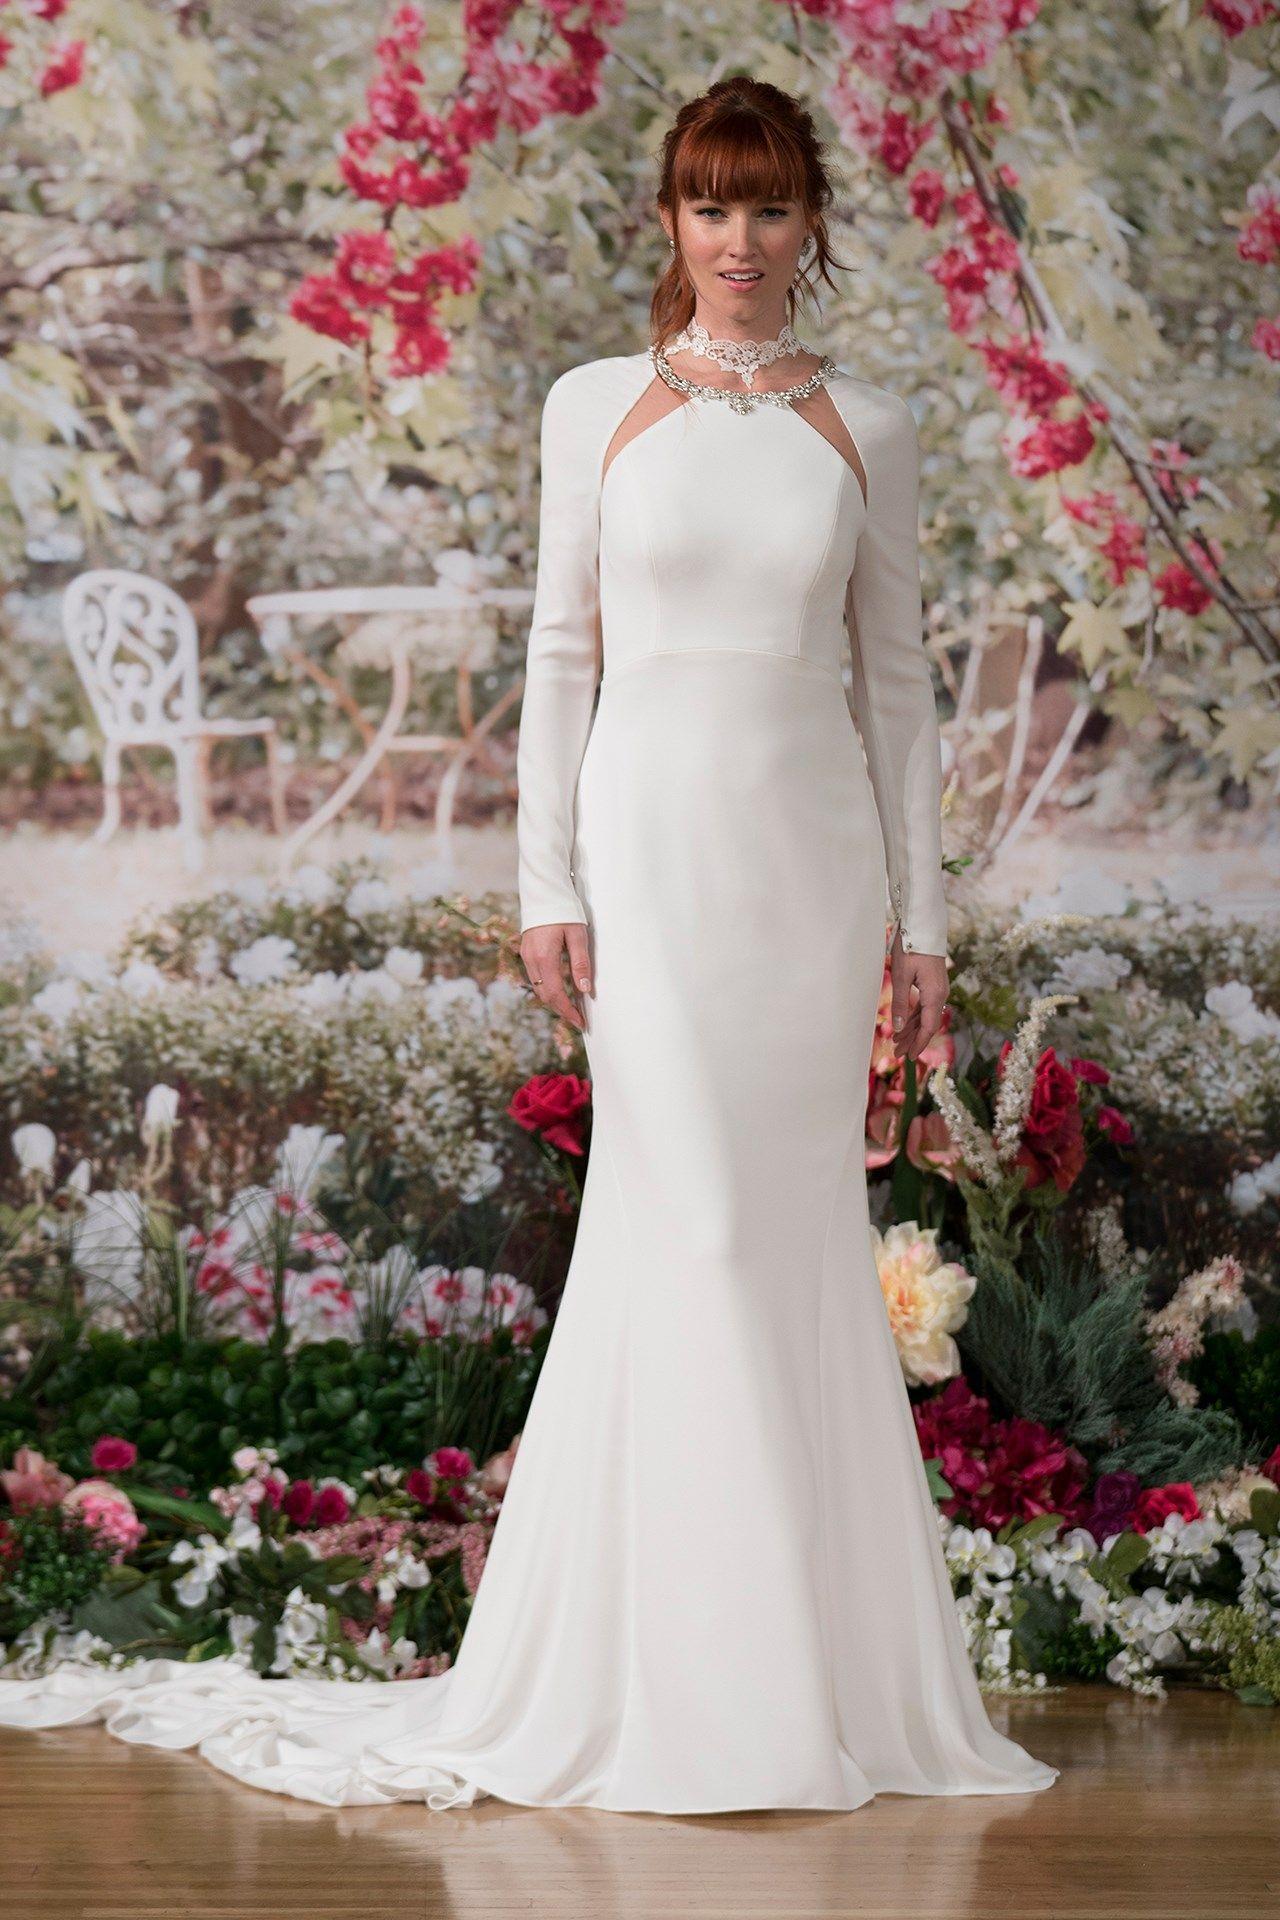 Wedding Ideas, Planning & Inspiration Wedding dresses uk